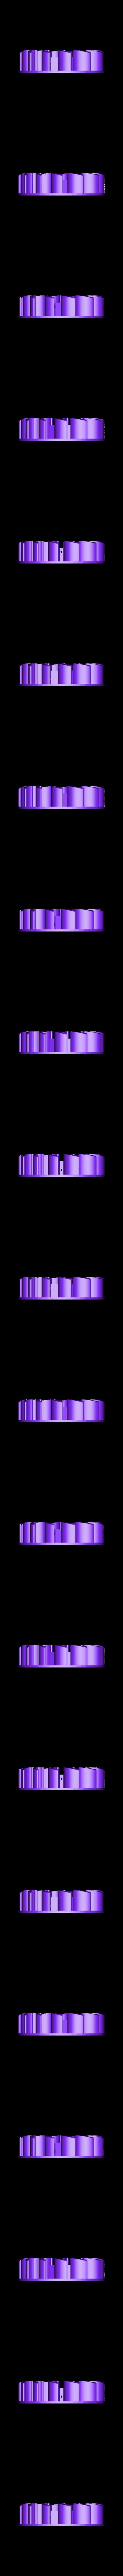 Impeller_blades.stl Download free STL file Bubbles! • 3D printer object, Zippityboomba